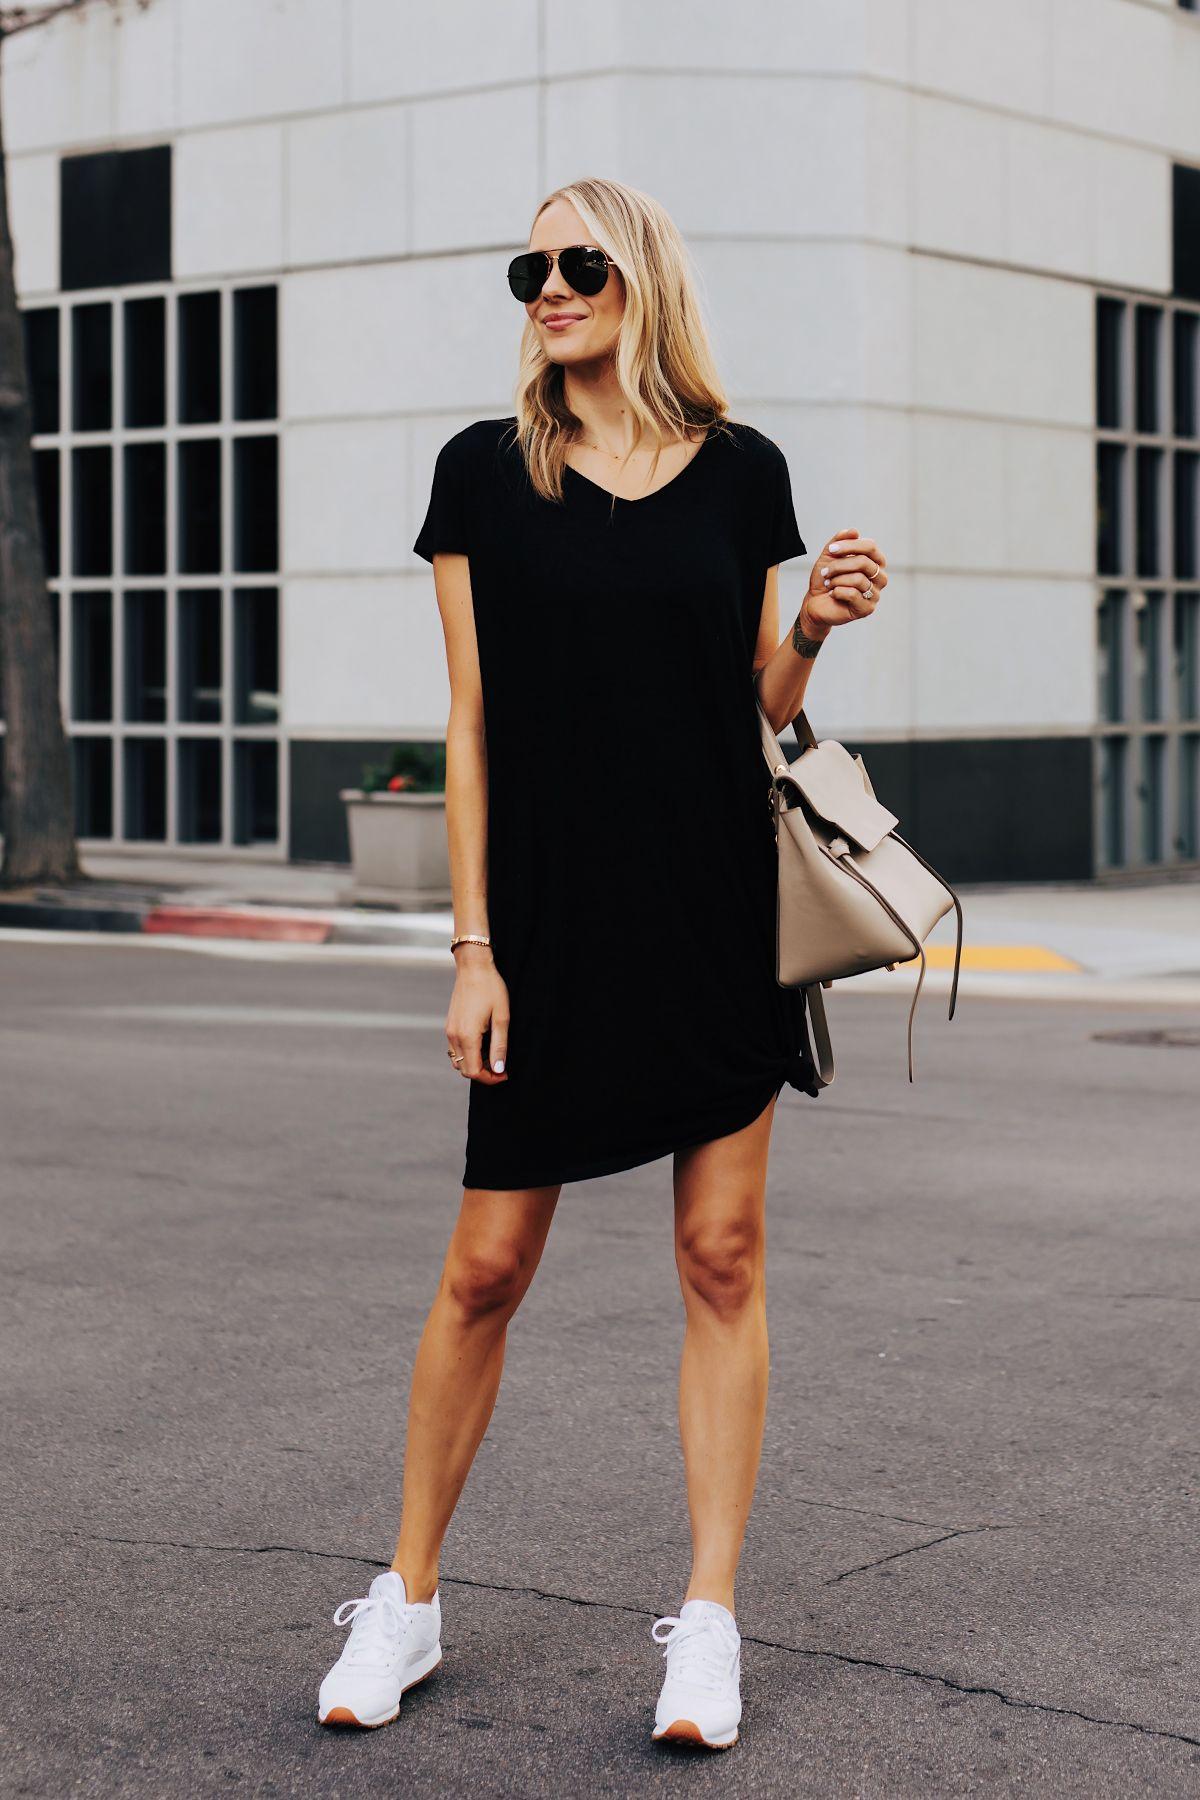 Black Tshirt Dress Reebok Classic White Sneakers Celine Mini Belt Bag Fashion Jackson S Dress And Sneakers Outfit Black Tshirt Dress Outfit Tshirt Dress Outfit [ 1800 x 1200 Pixel ]